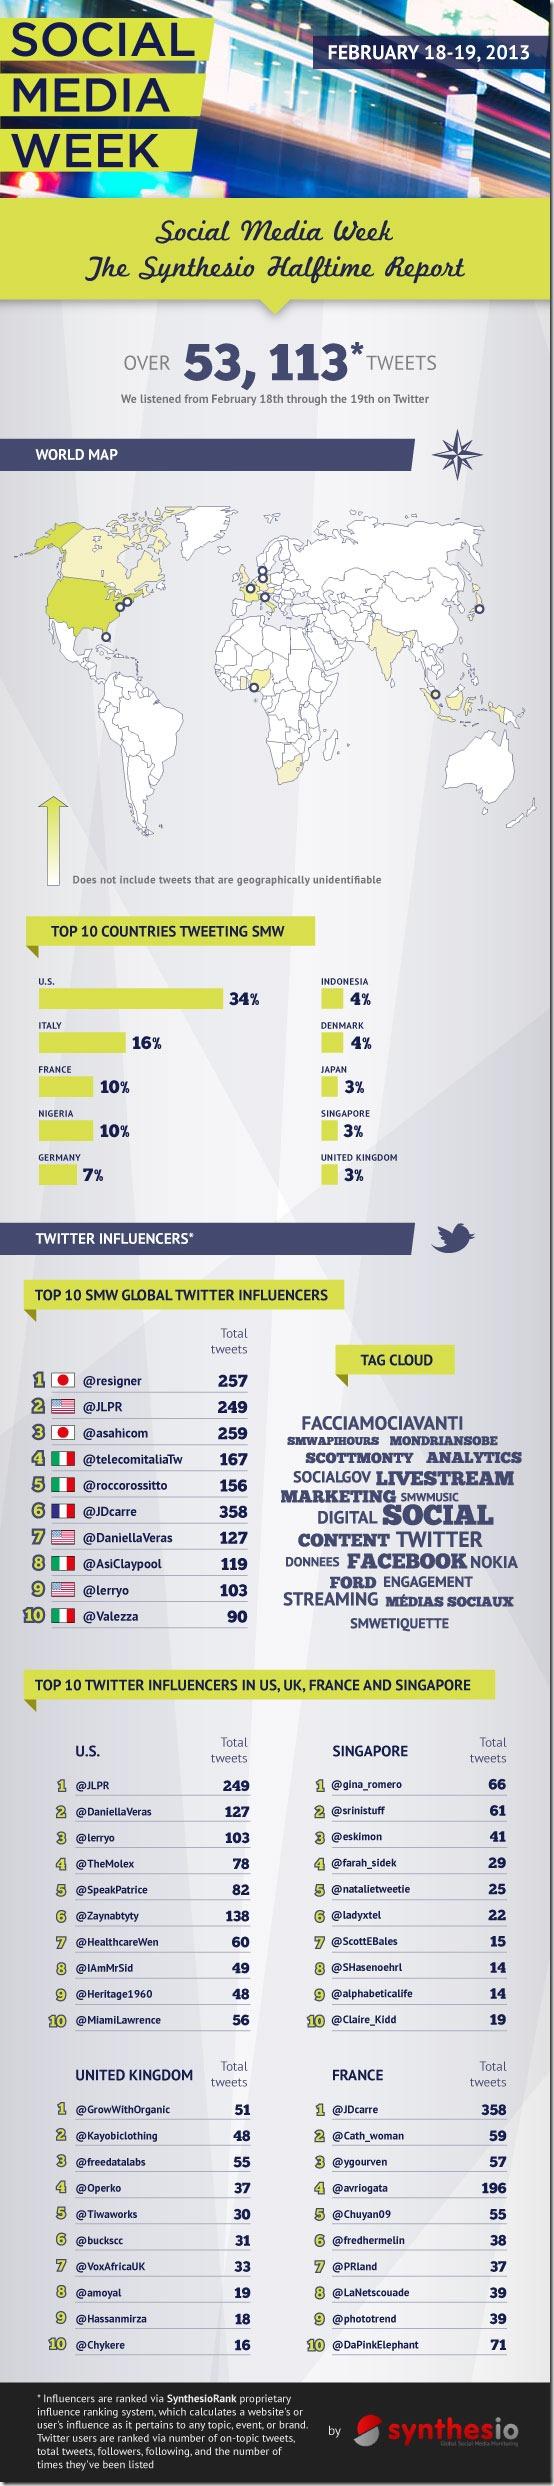 socialmediaweekinfluencers2013